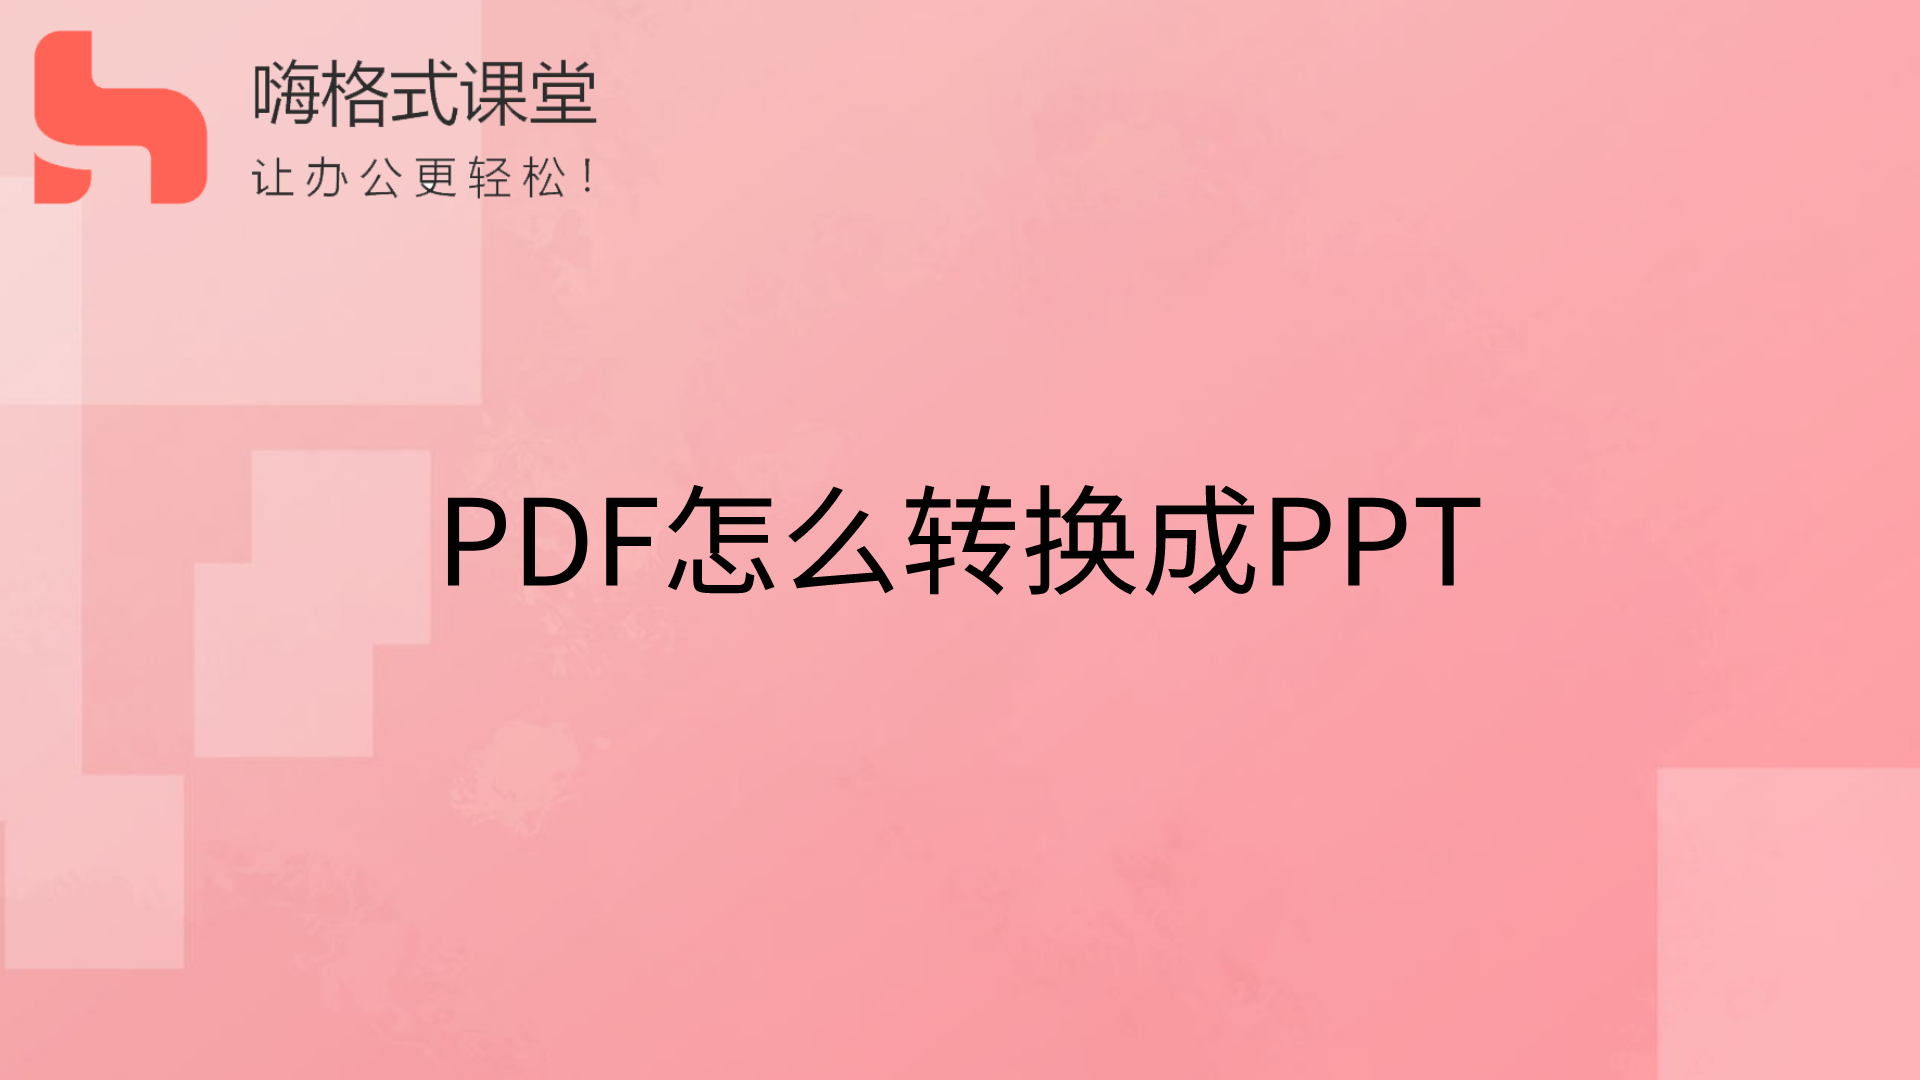 PDF怎么转换成PPT